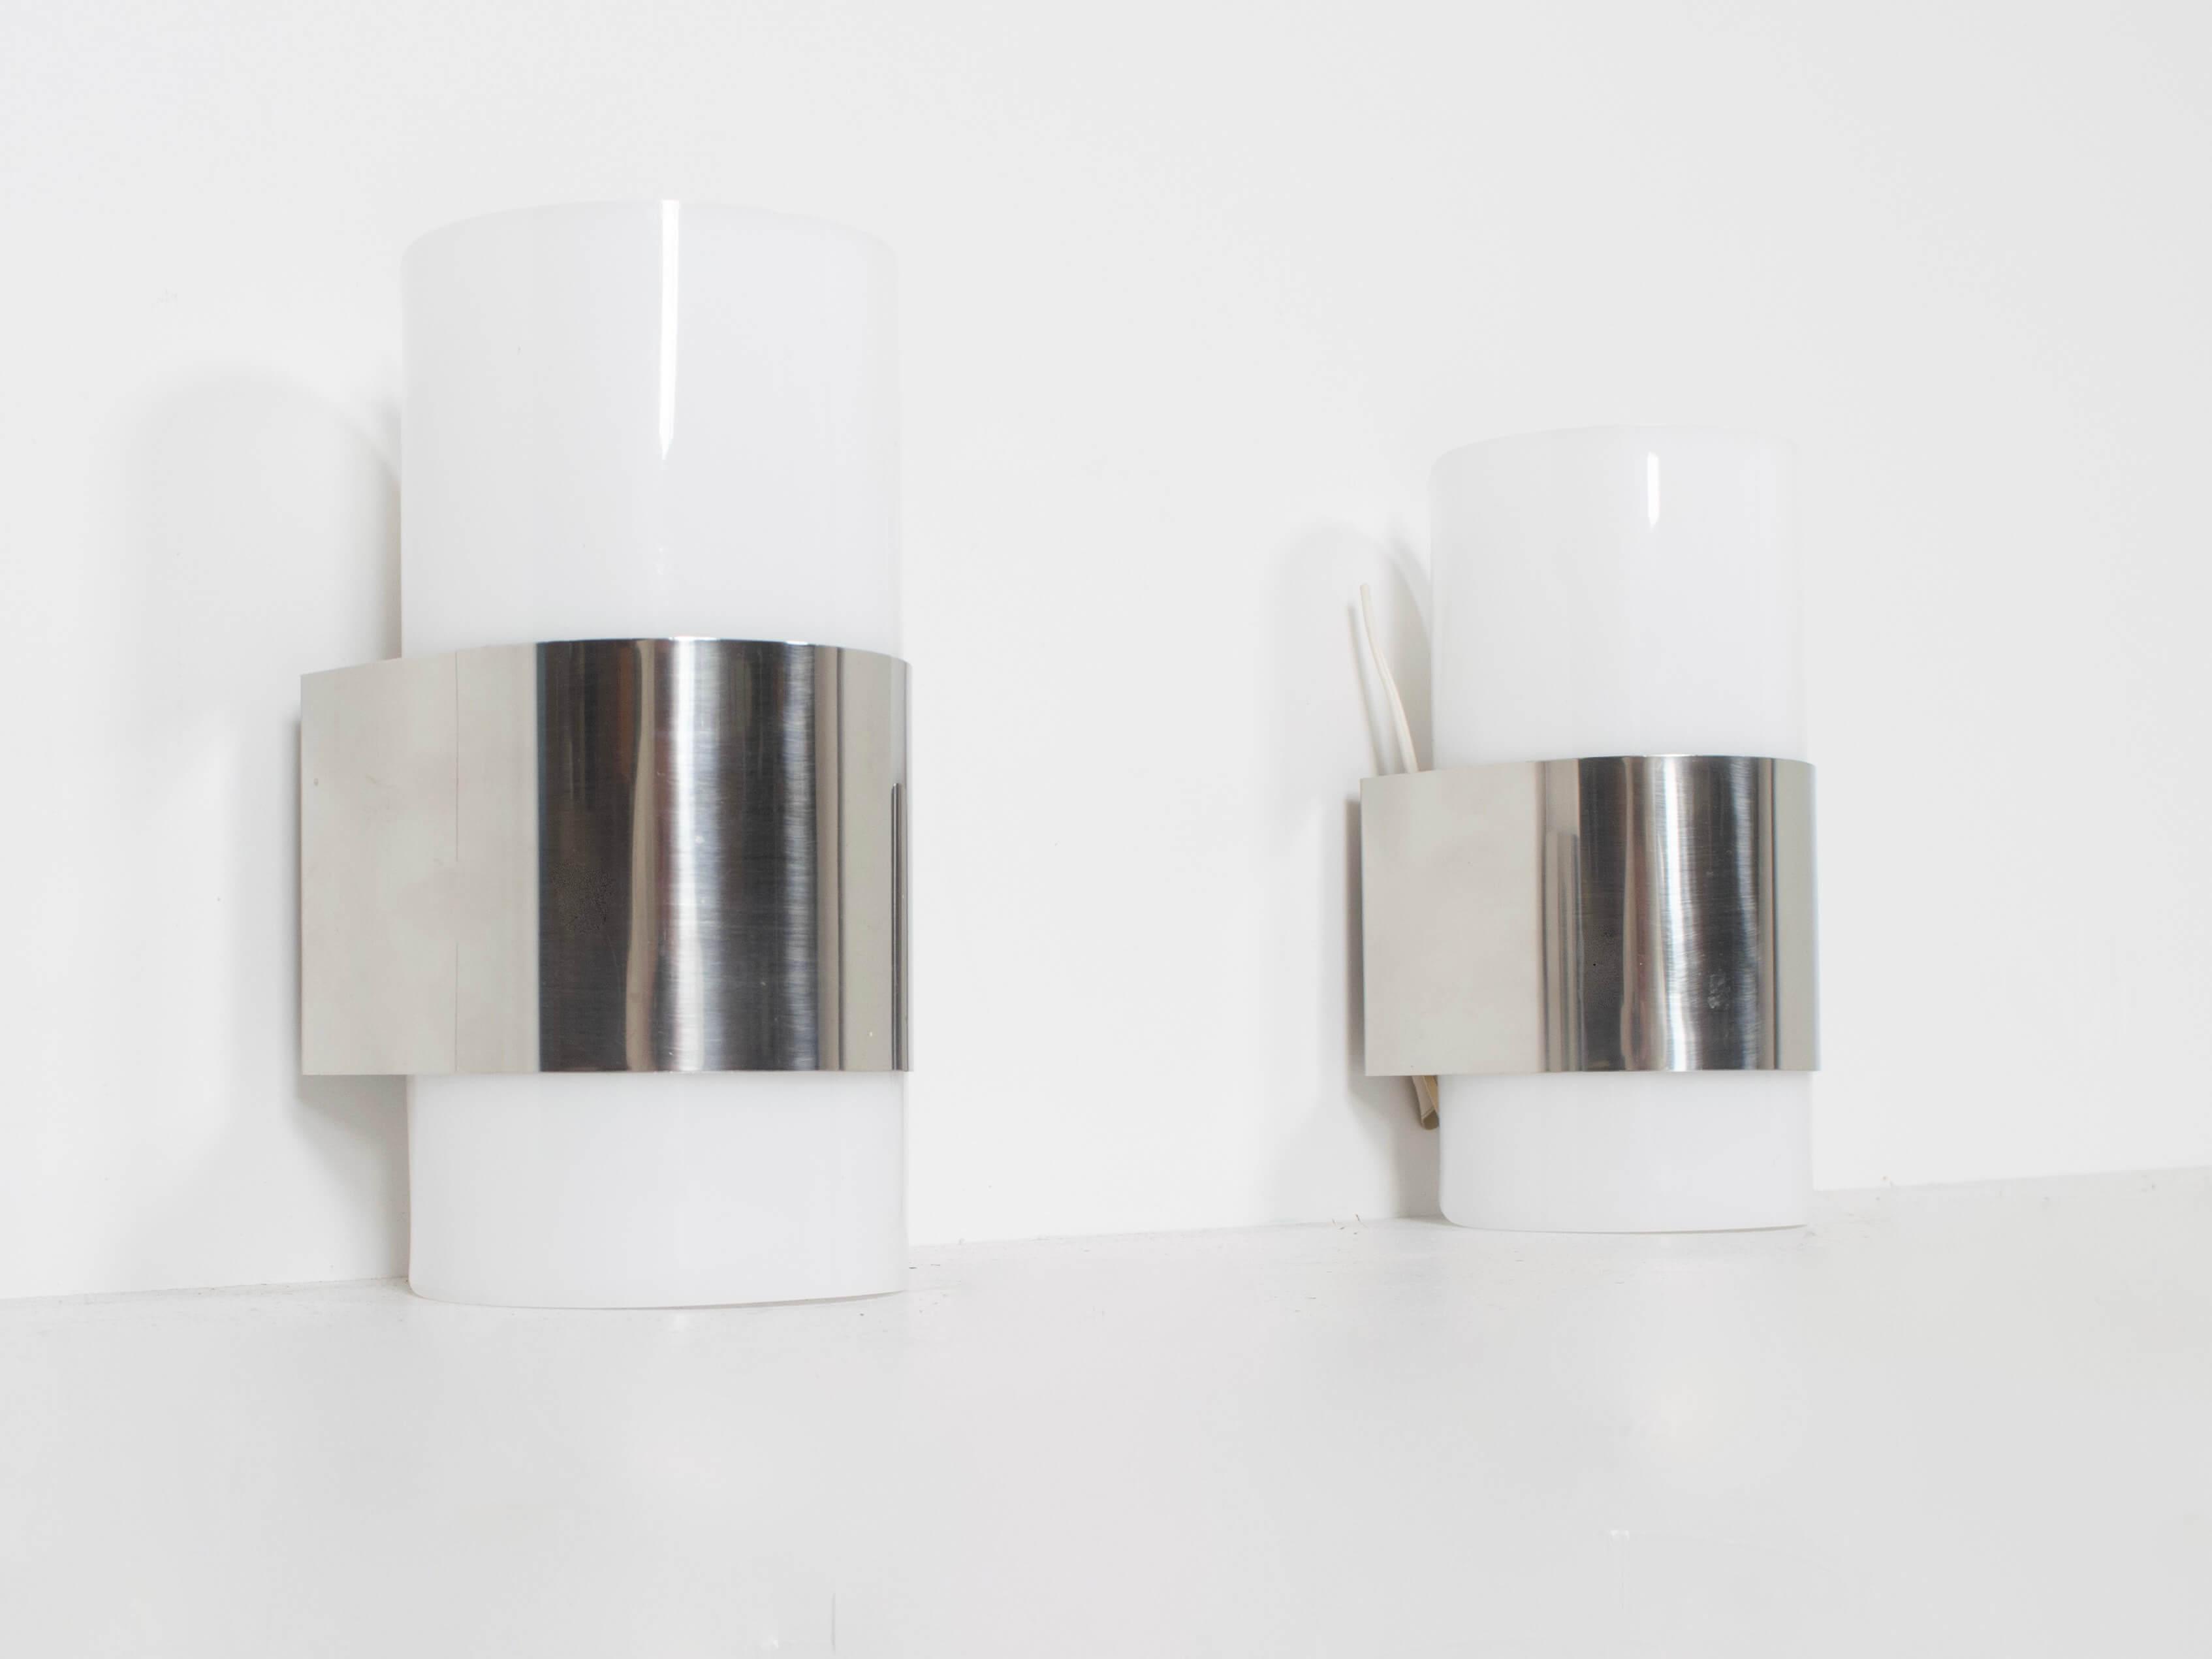 Set of Two Metracrilato Wall Lights from Metalarte, 1980s Spain